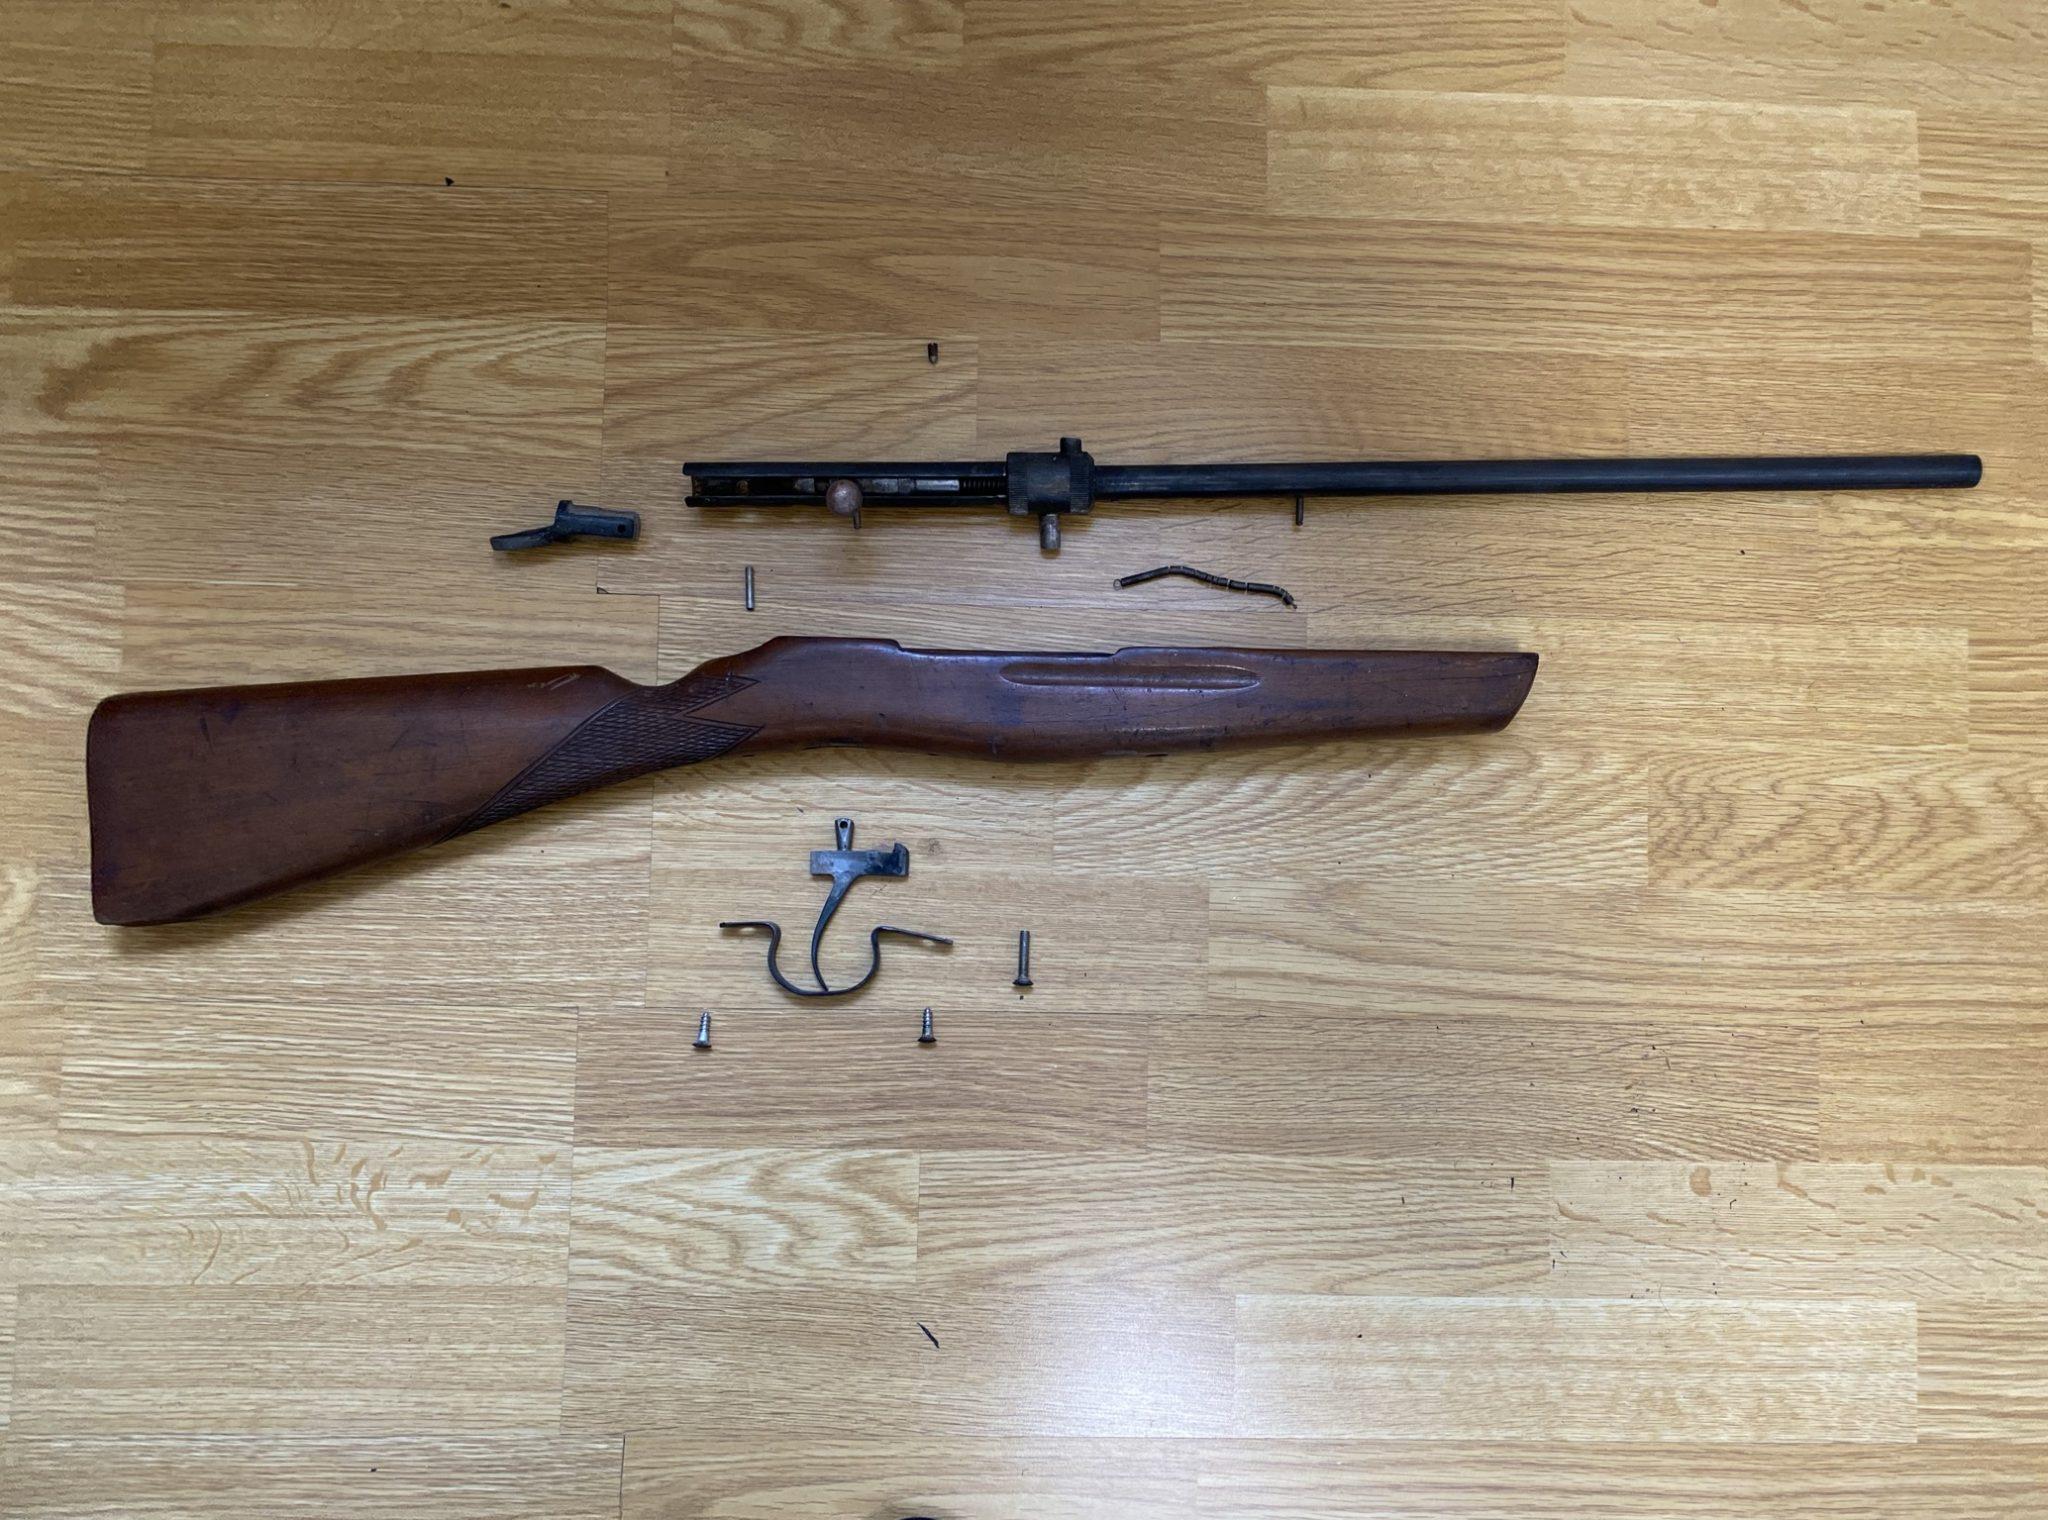 09226F22 435C 4EF7 8F5F 4ED444EF6678 - 射的銃(コルク)のレストアpart2